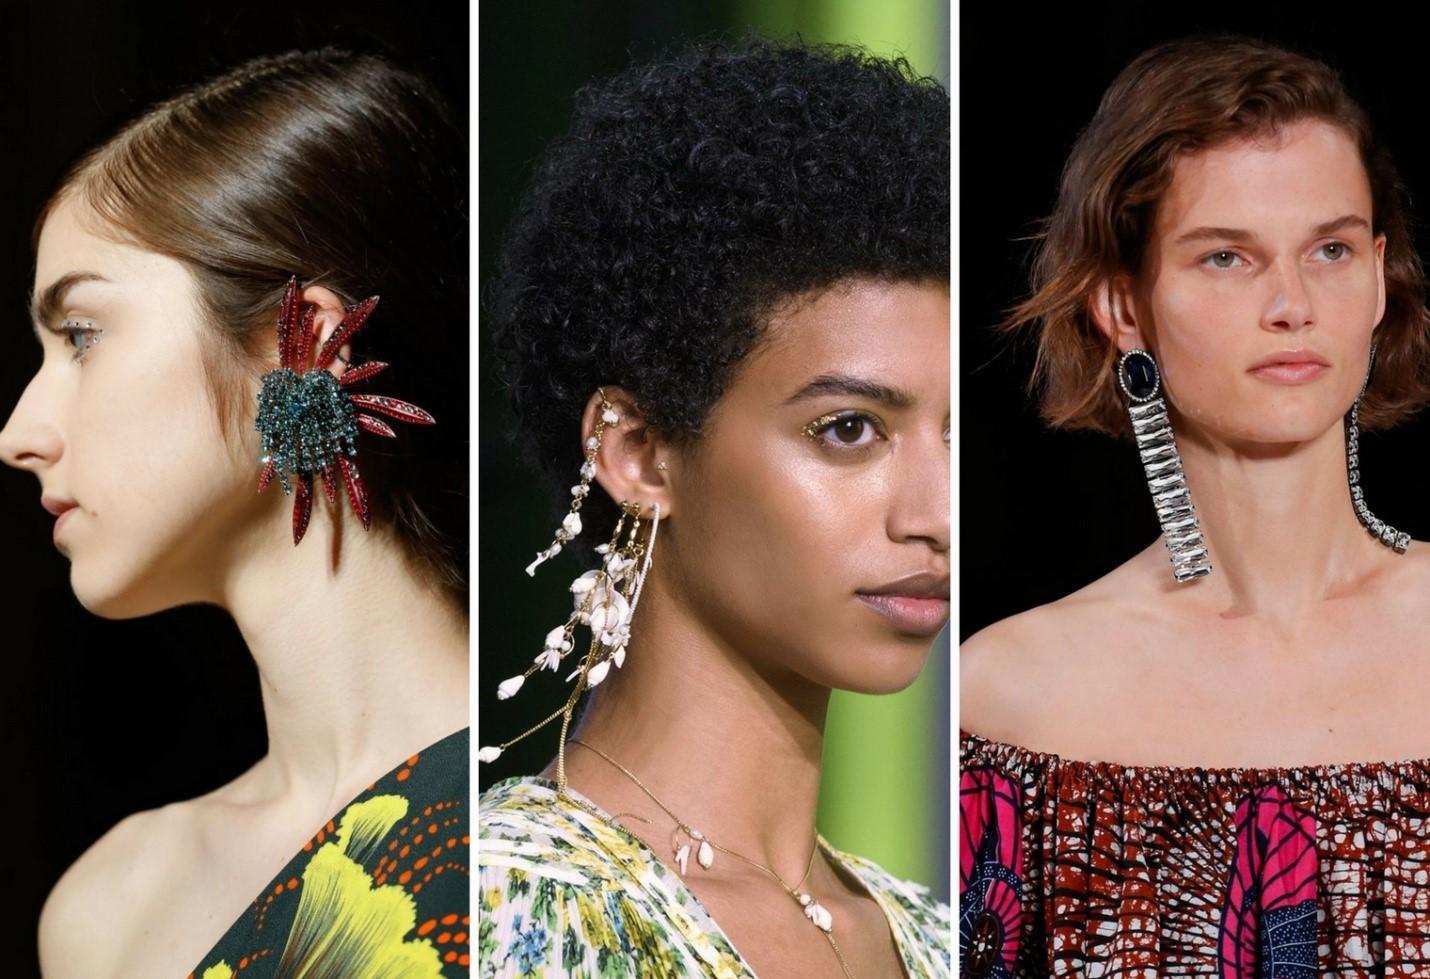 Statement Earrings jewellery trends for 2018 - Statement Earrings - Jewellery trends for 2018 – Bangalore